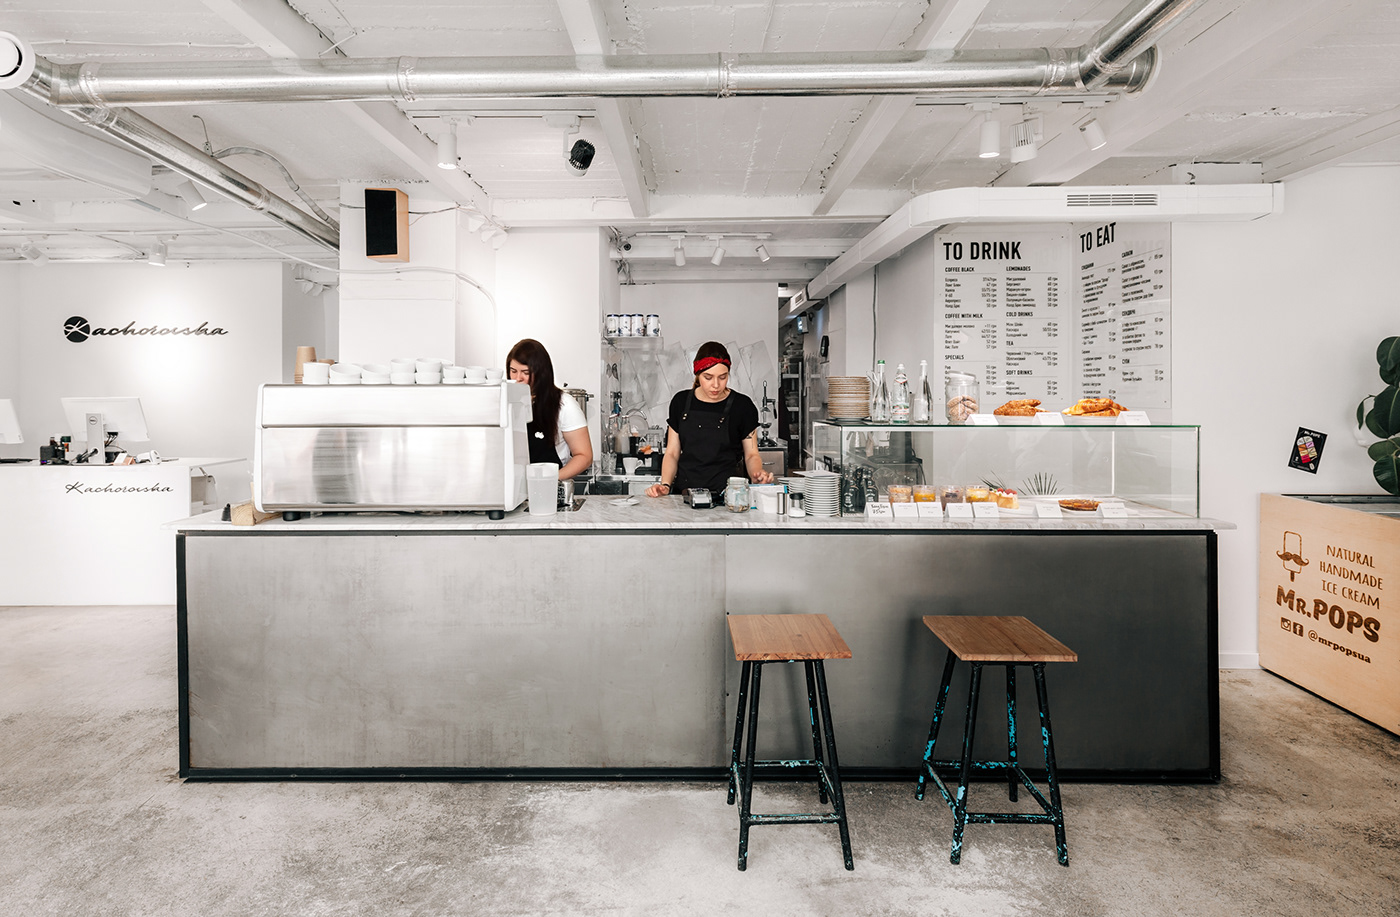 Kachorovska Store   Cafe on Behance 2d086e45dd2d2